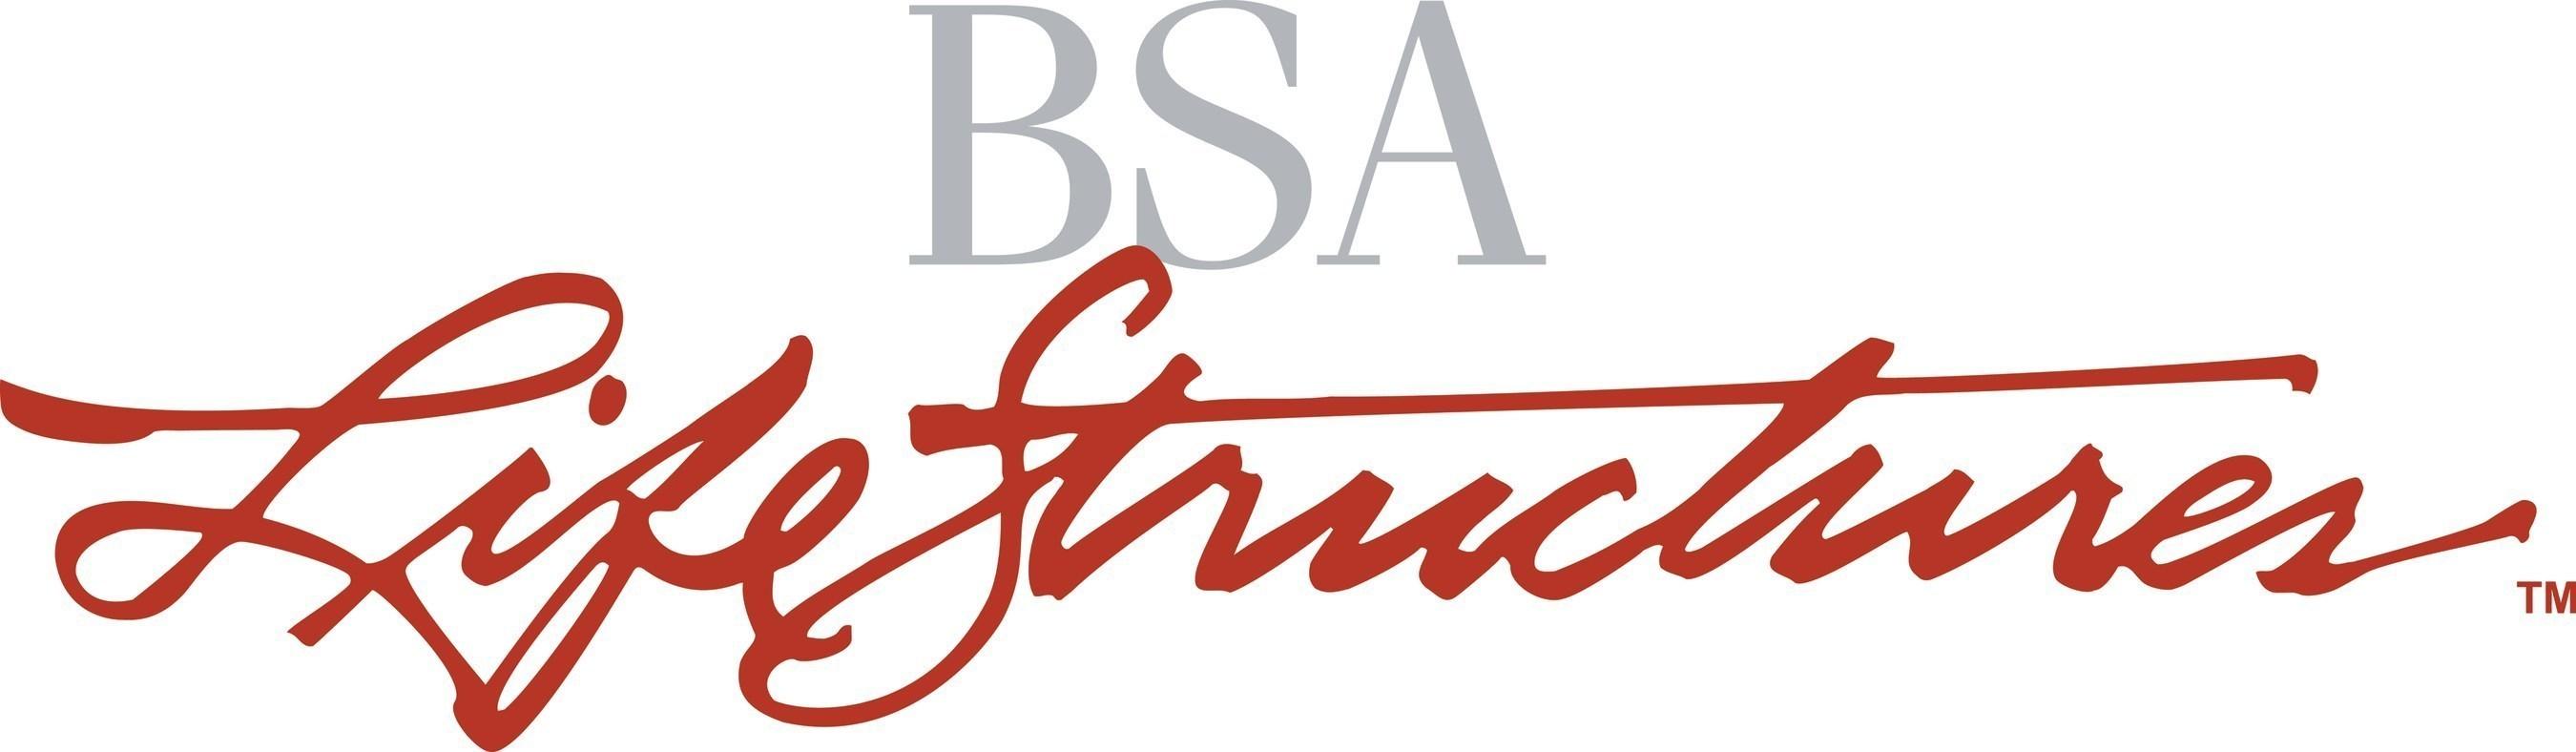 BSA LifeStructures Logo